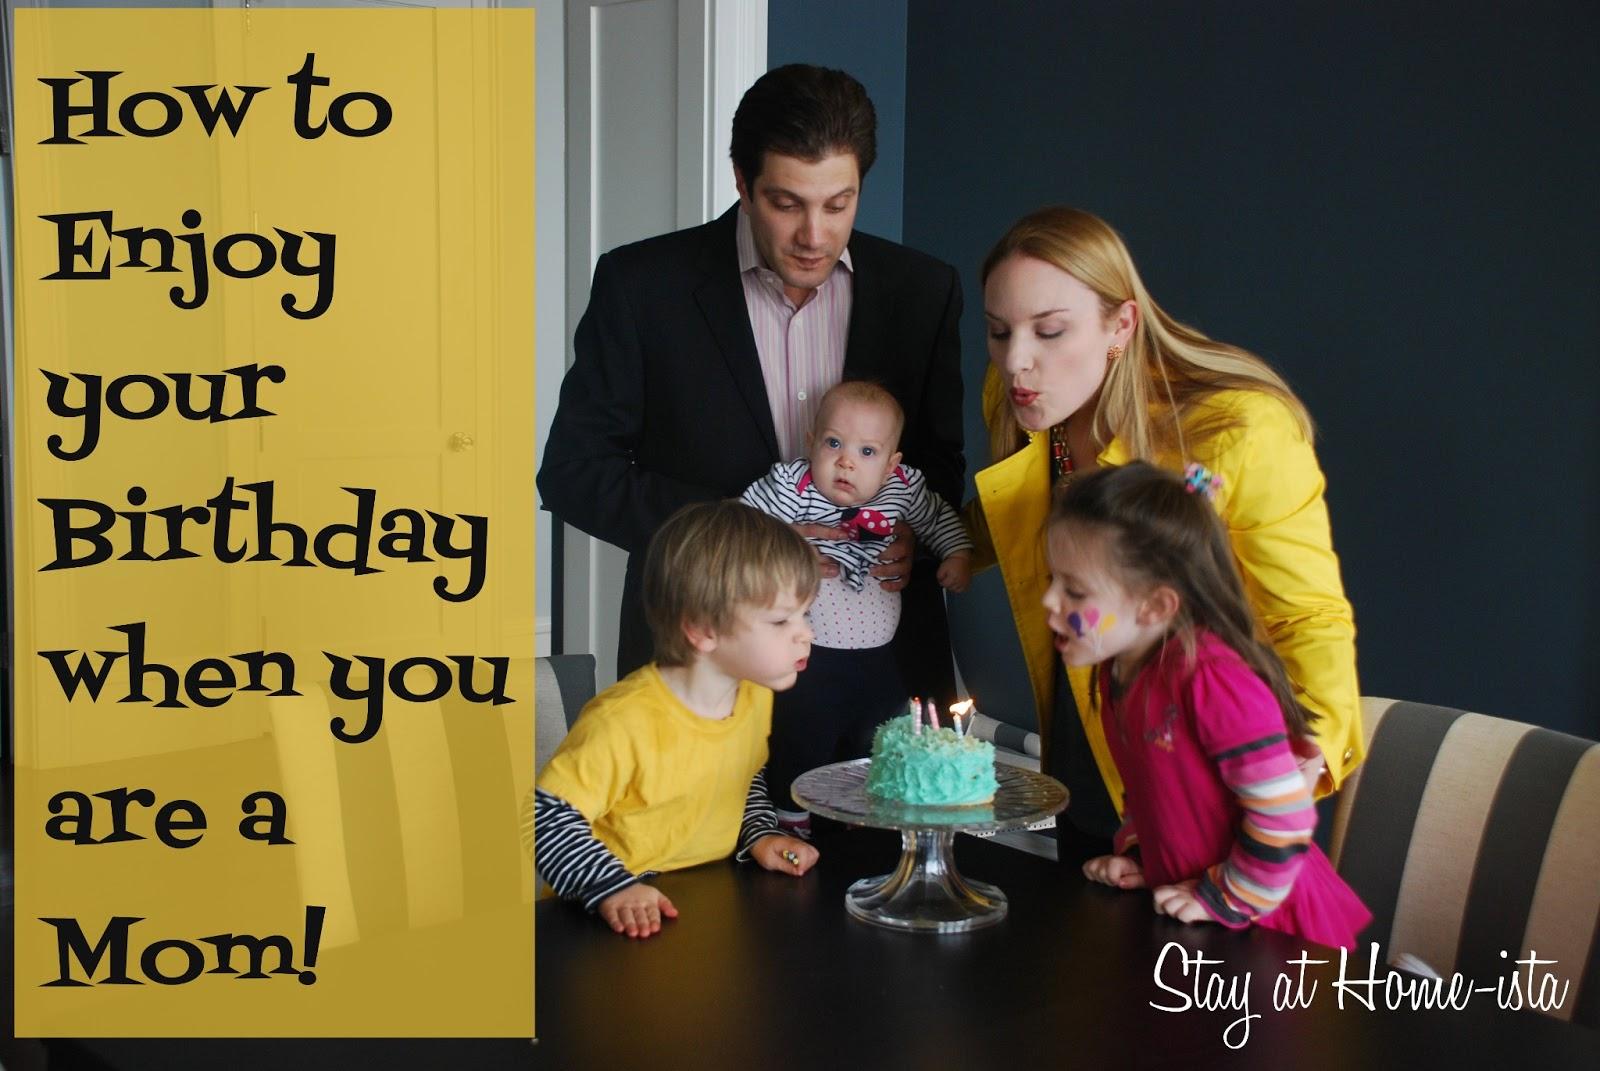 How to Enjoy Your Birthday